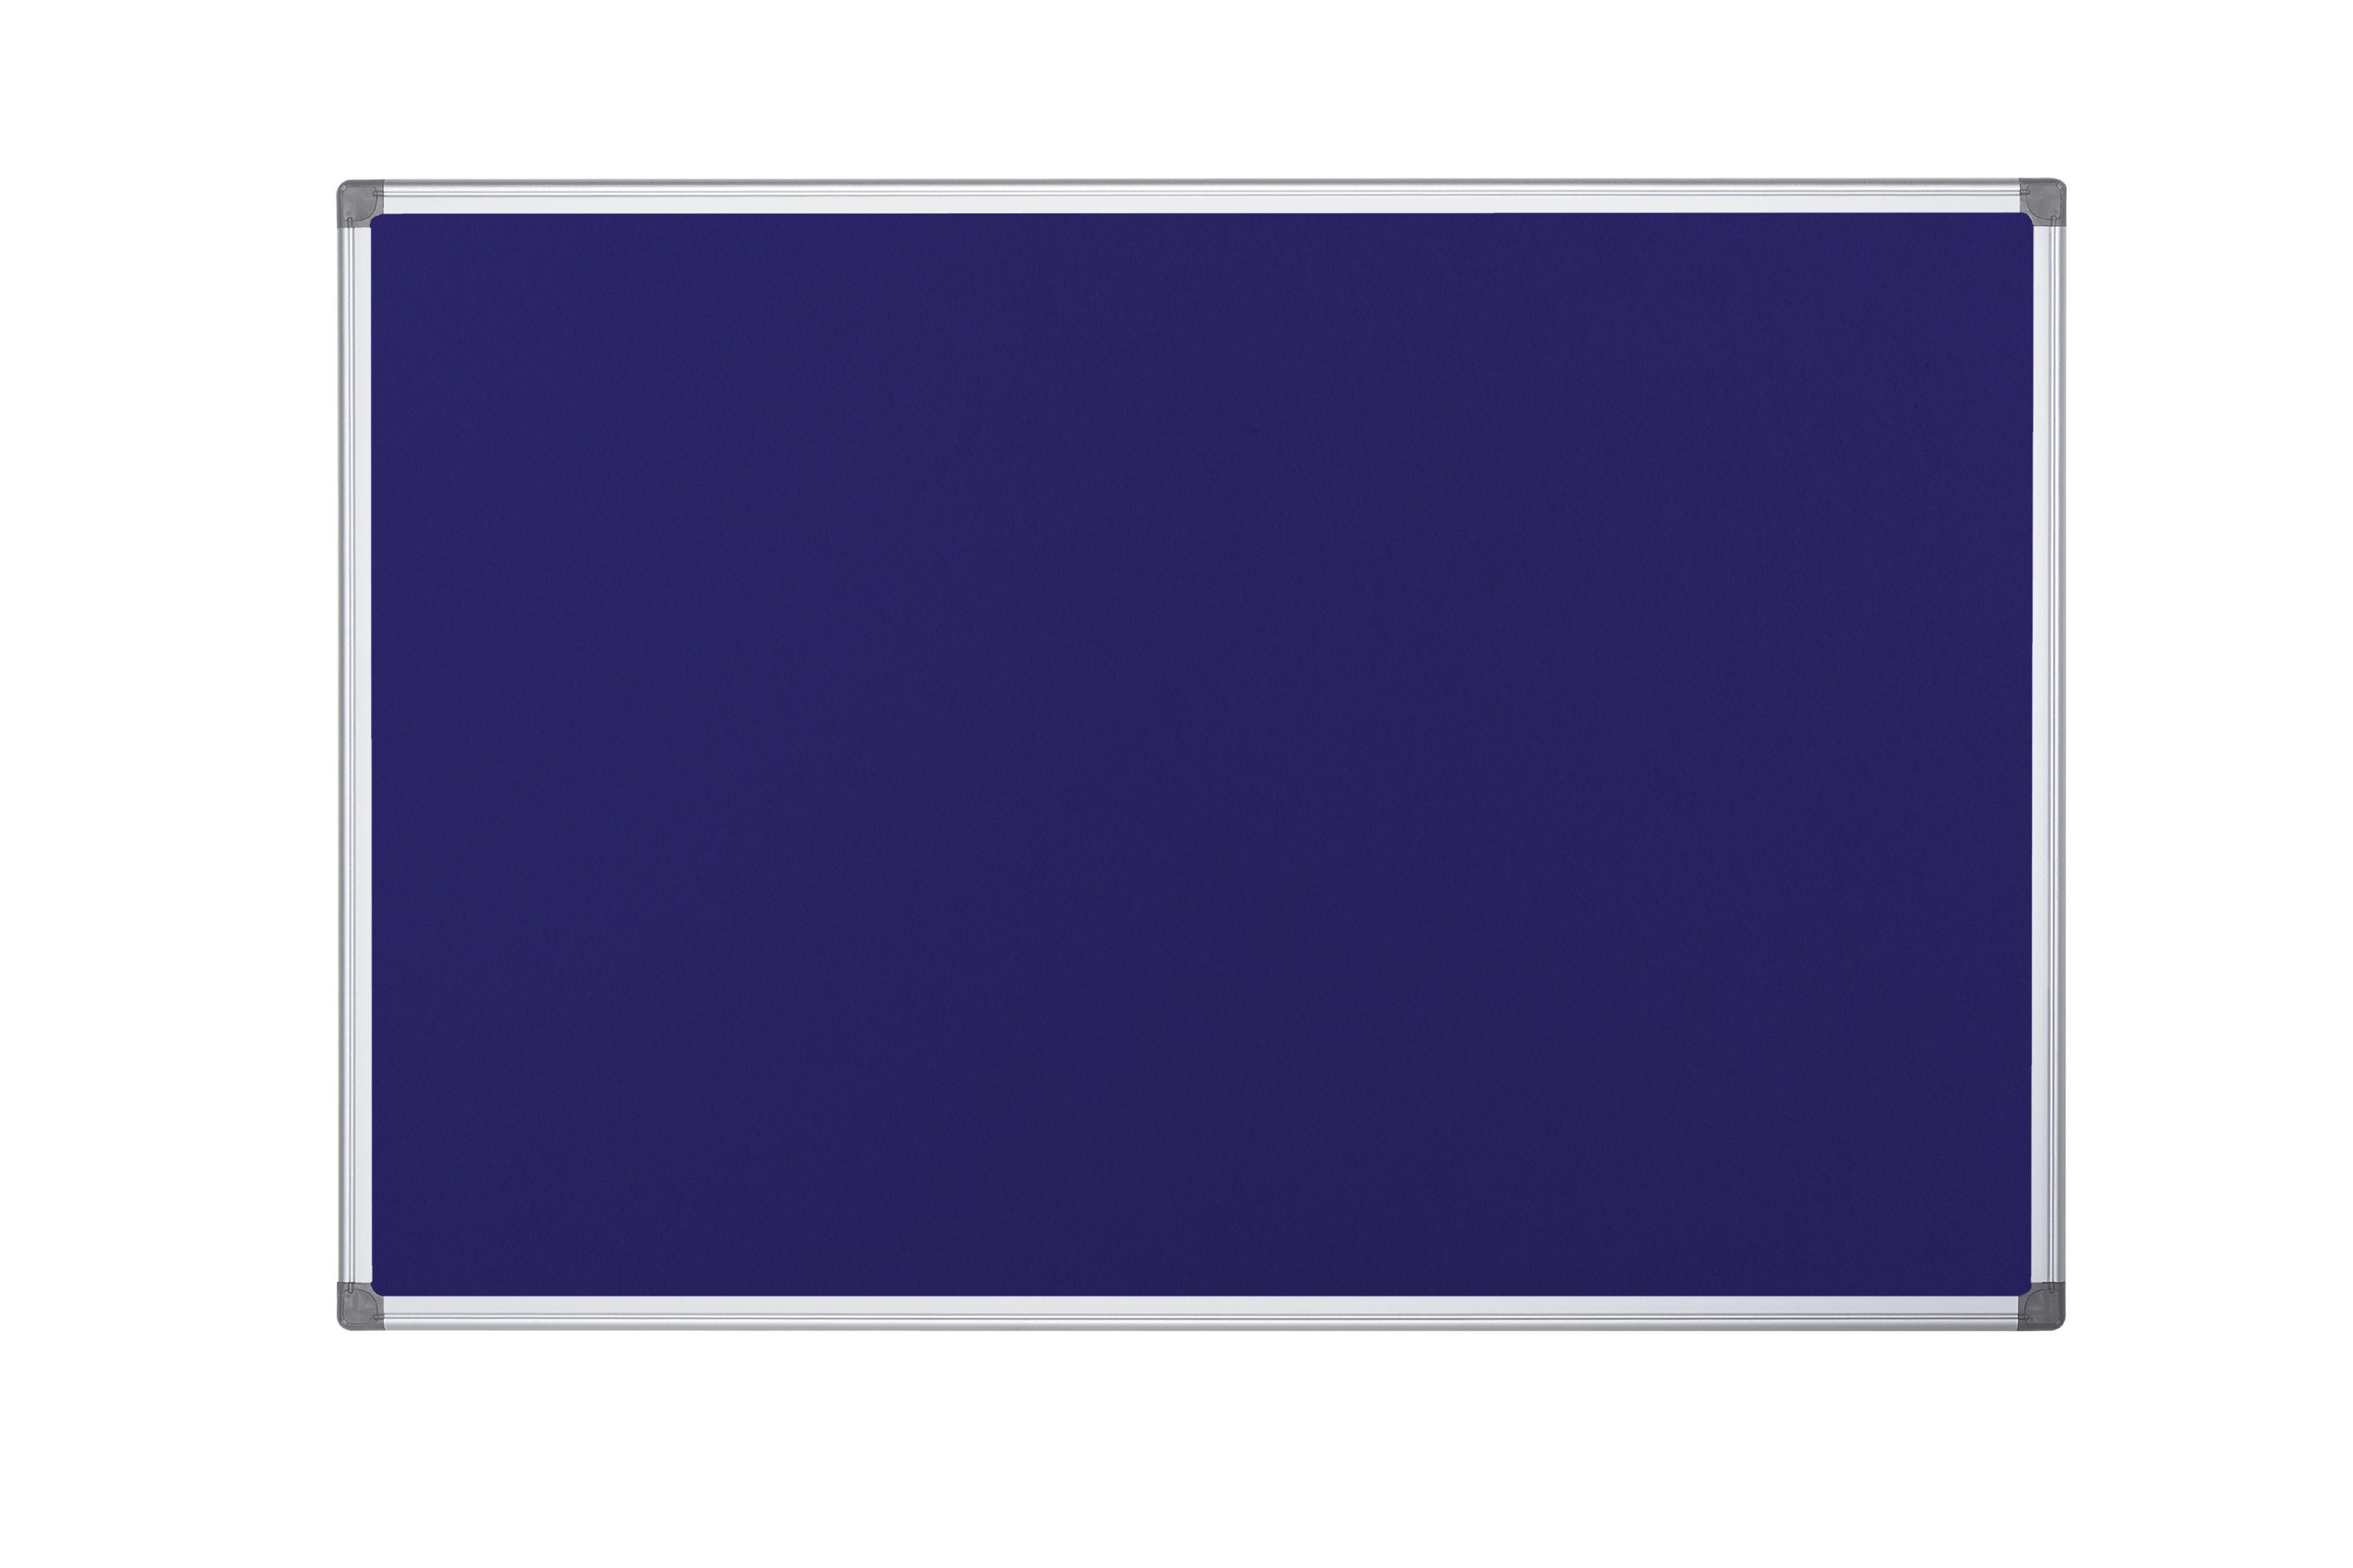 Felt Bi-Office Maya Blue Felt Noticeboard Double Sided Aluminium Frame 900x600mm